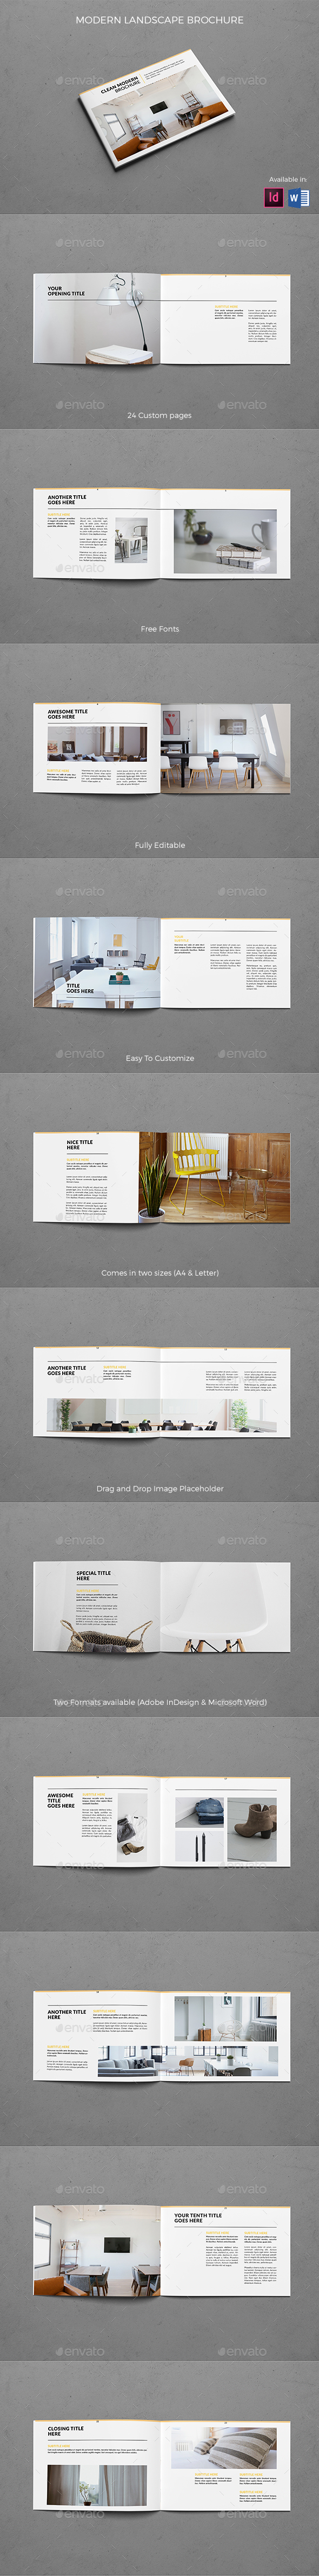 Landscape Clean Modern Brochure - Brochures Print Templates